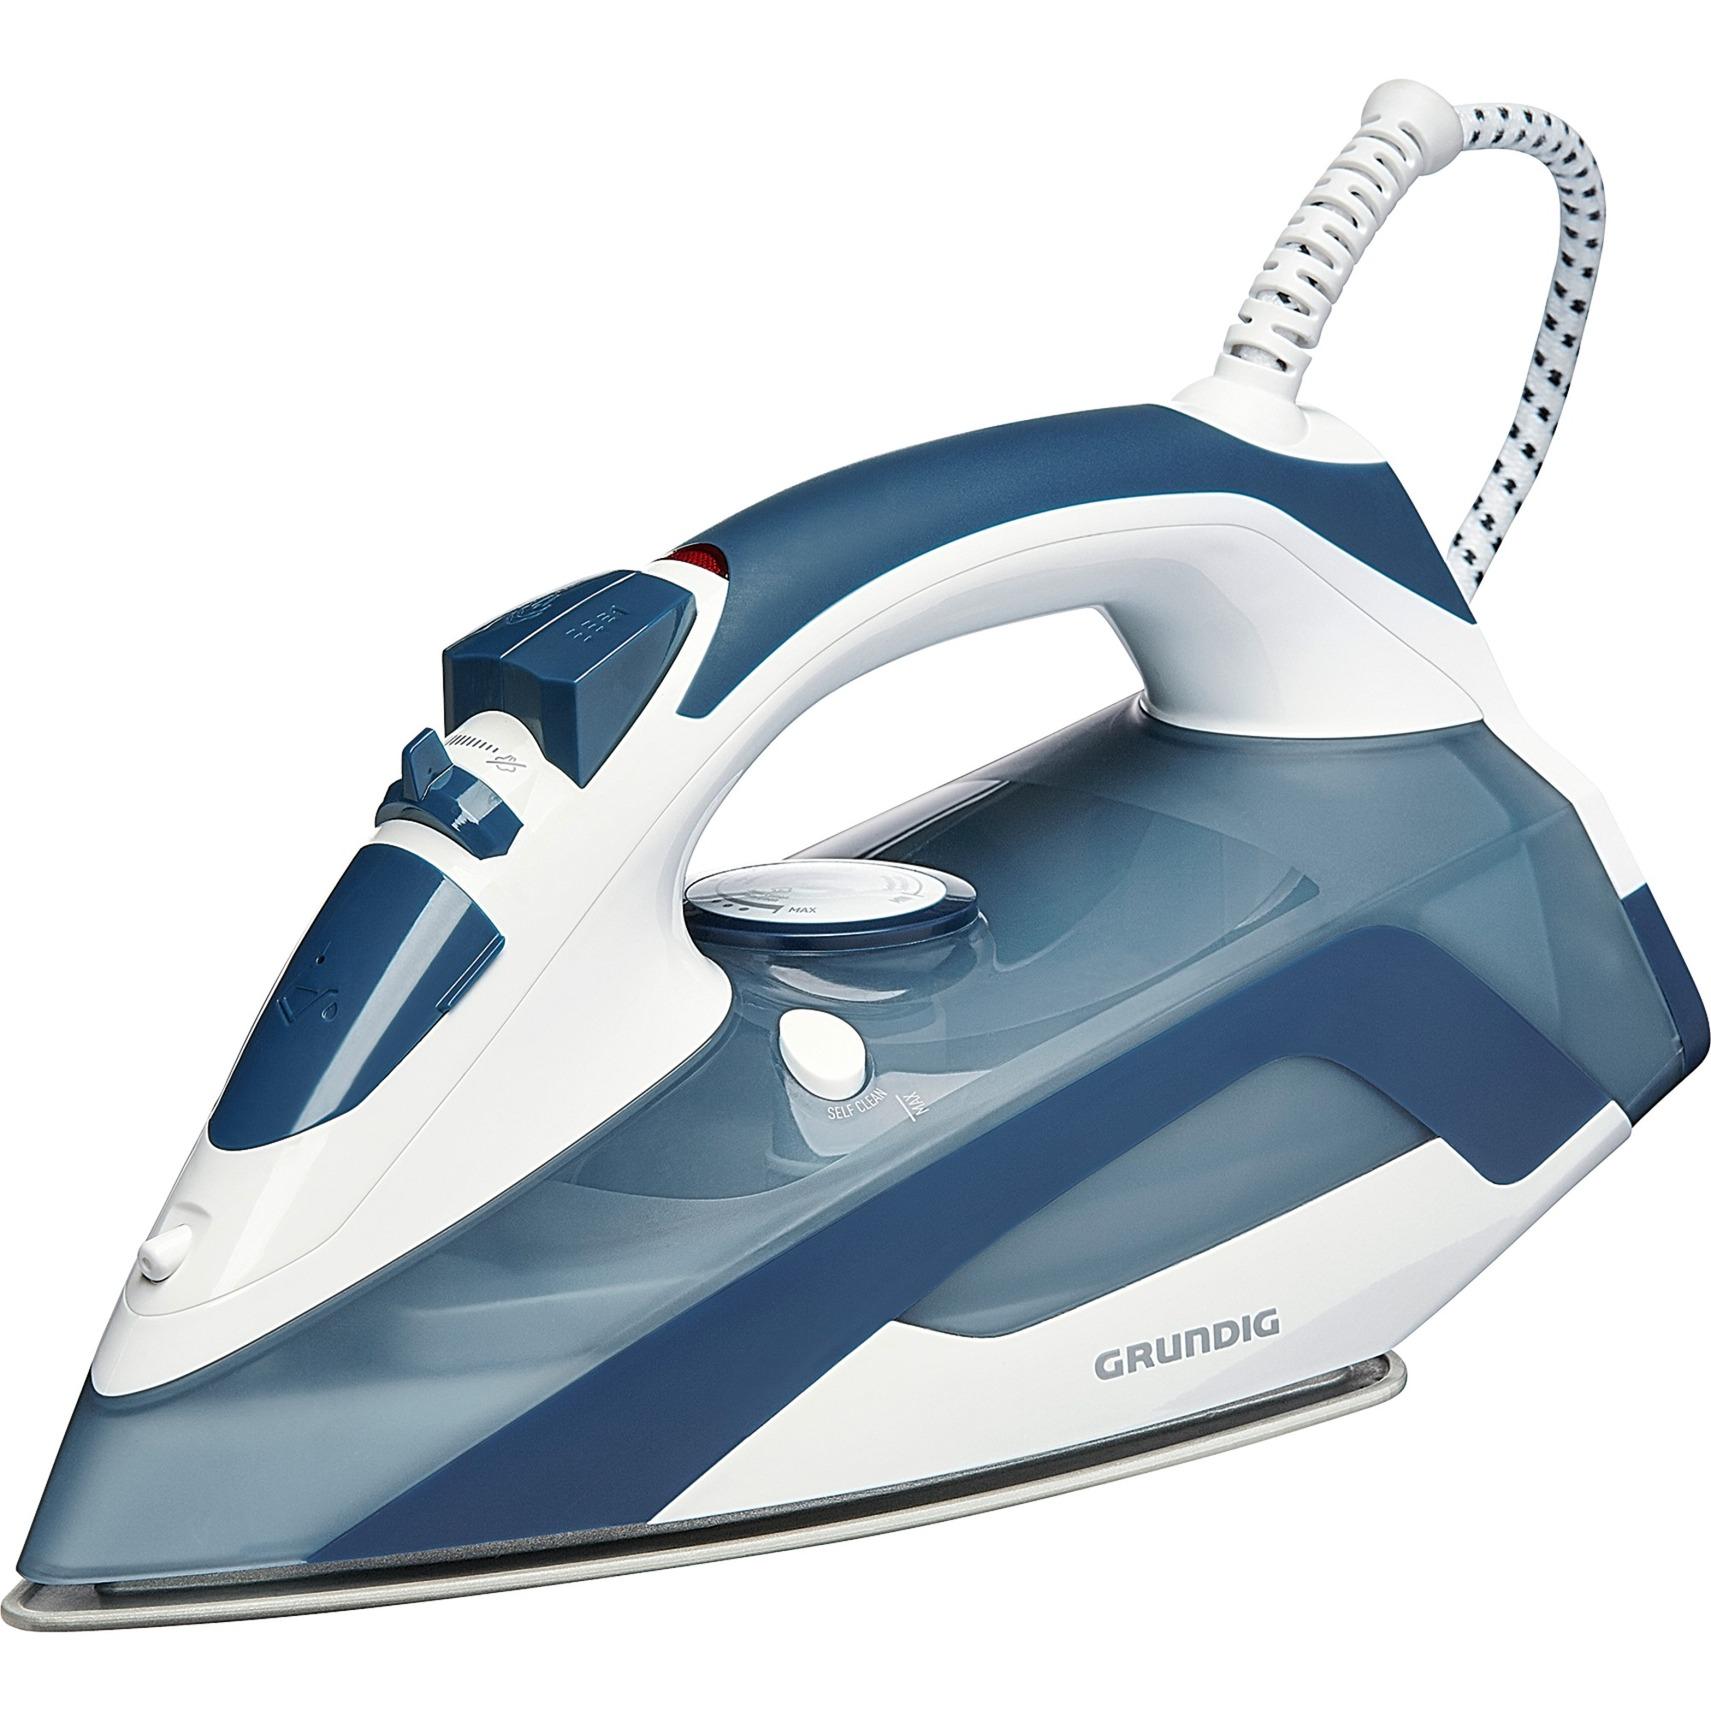 SI 4550 Plancha a vapor Suela de cerámica Azul, Blanco 2300 W